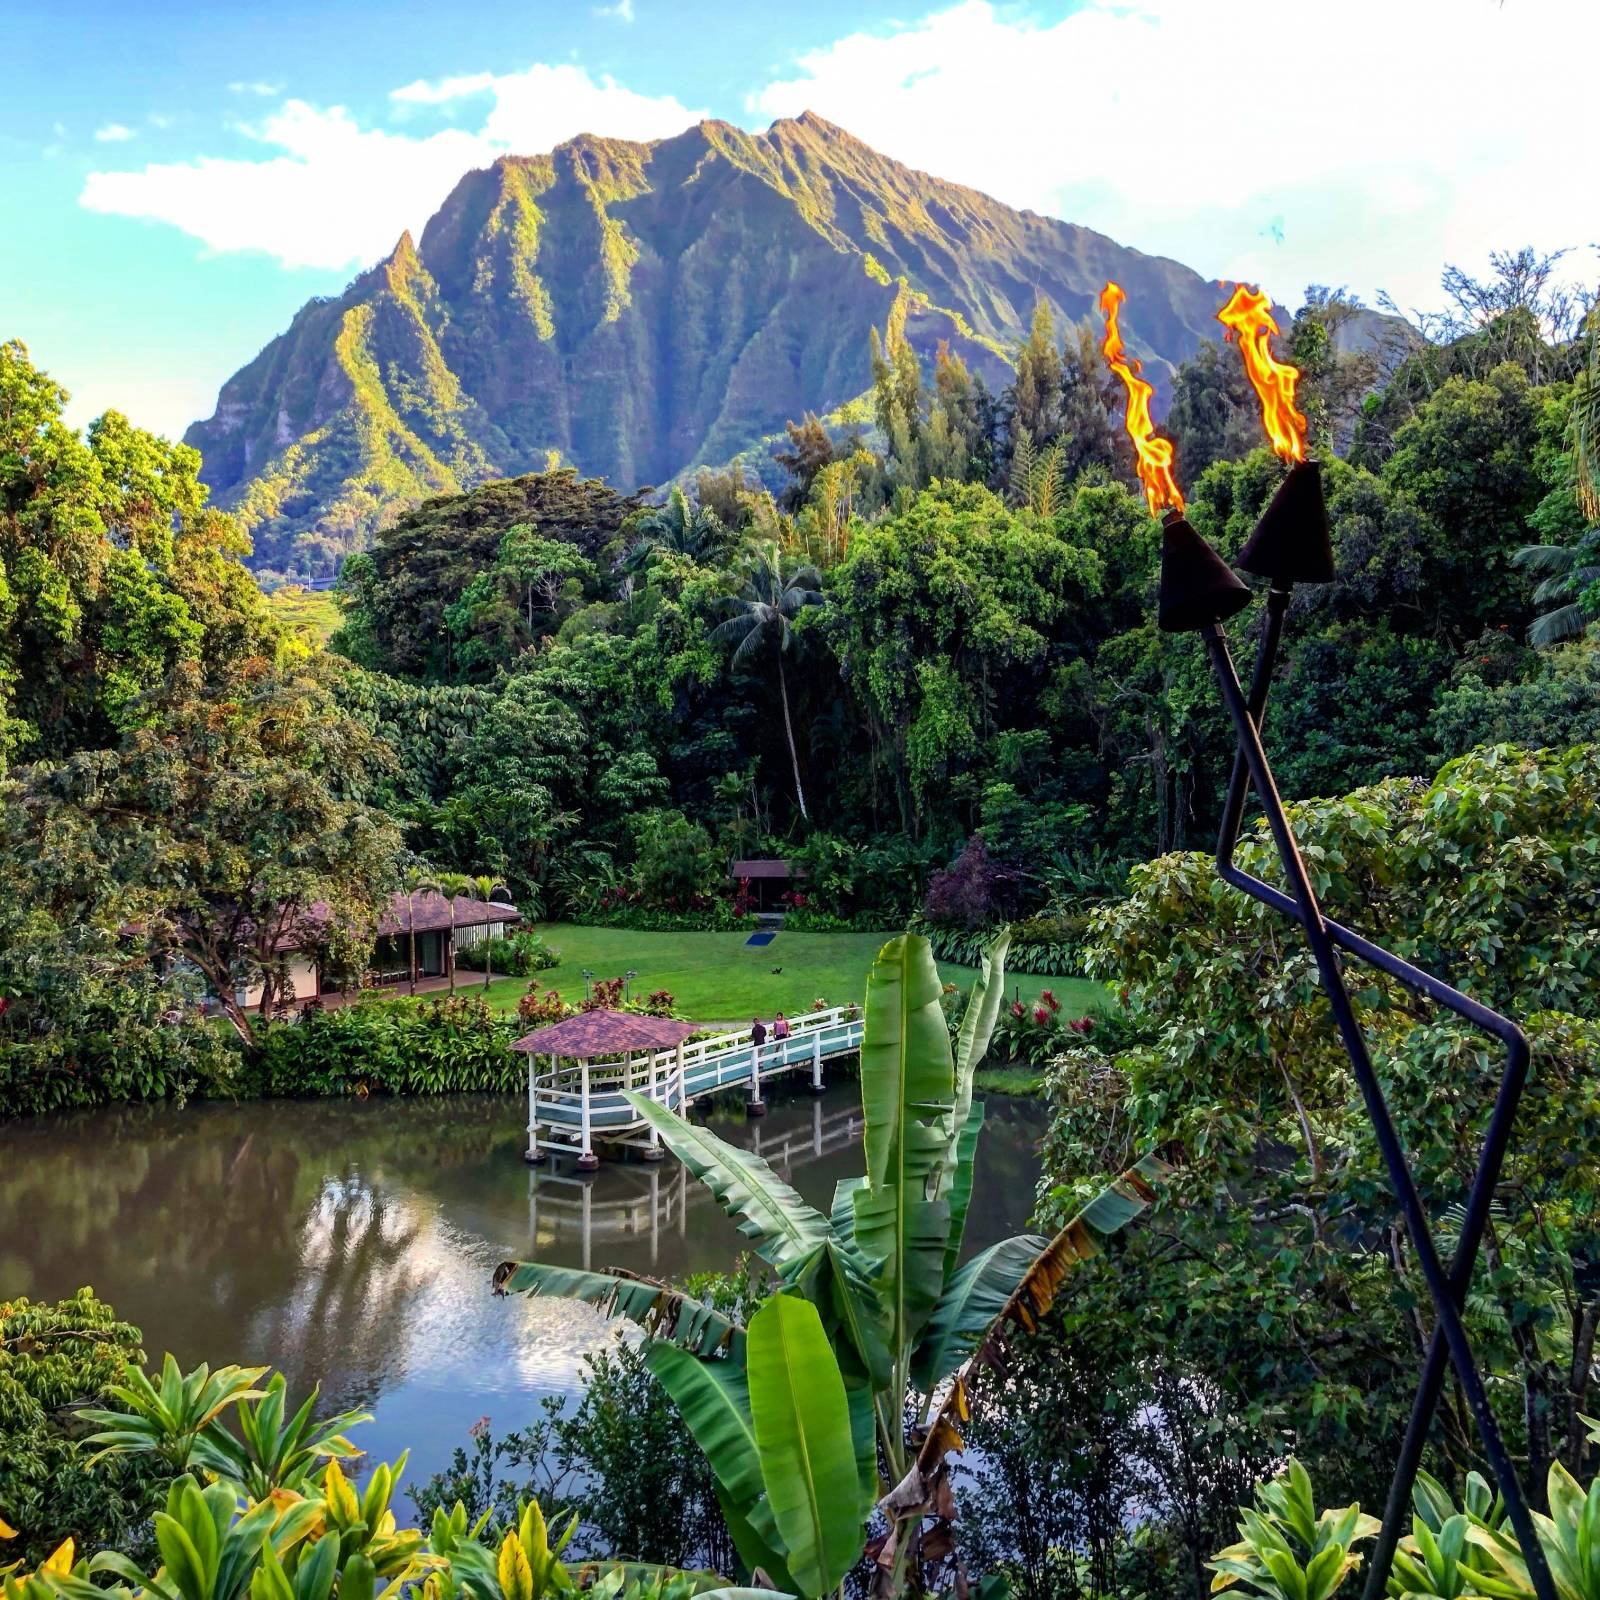 Oahu Property Tax Rates 2019-2020 - Hawaii Real Estate ...